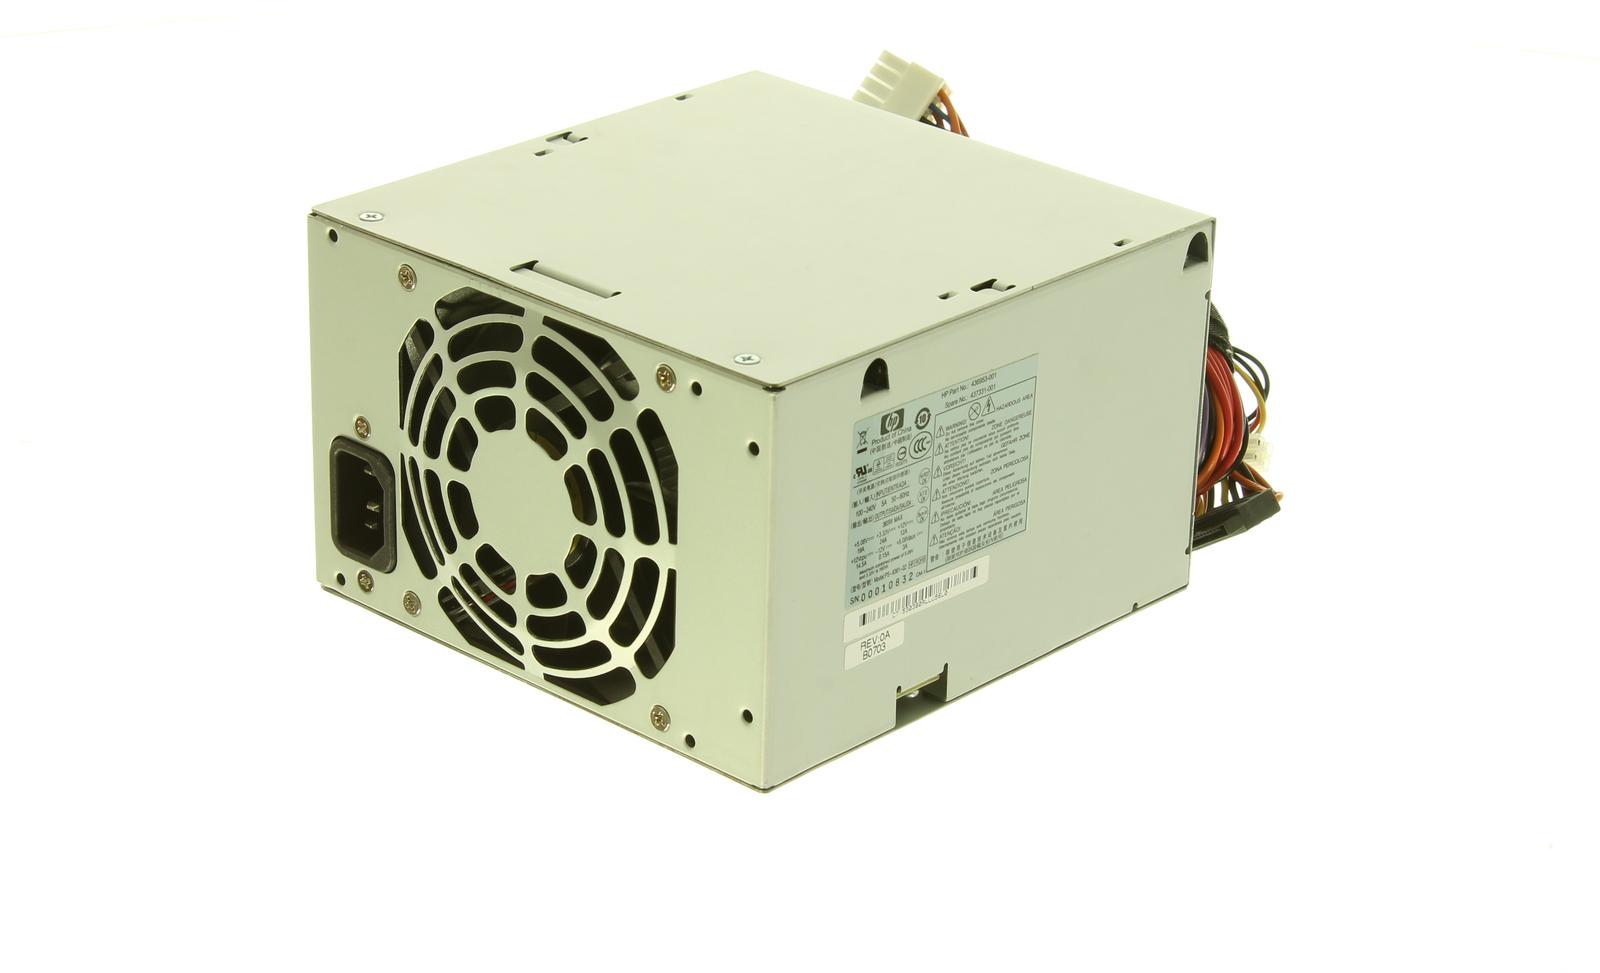 HP DC7700CMT 80% Efficient 365W **Refurbished** RP000112095 - eet01